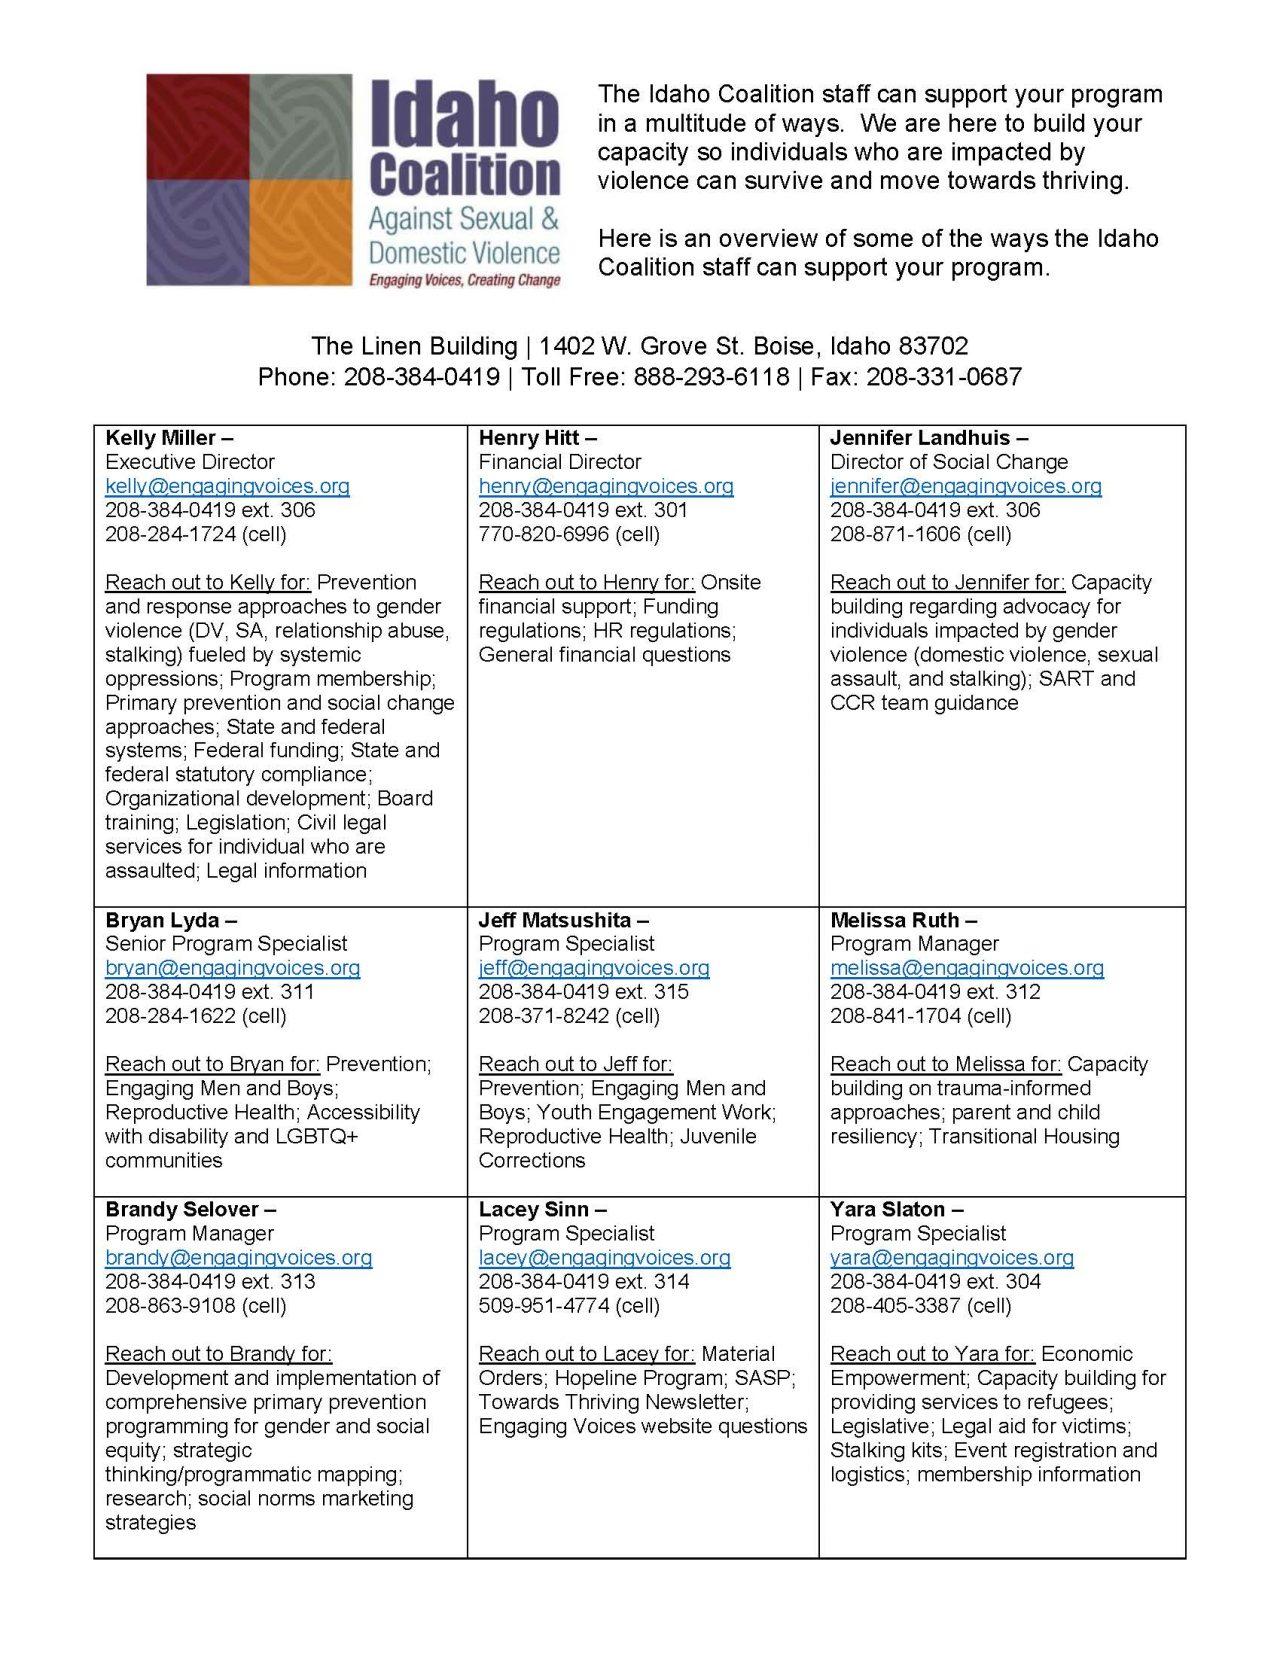 Idaho Coalition Staff Program Reference Page Image